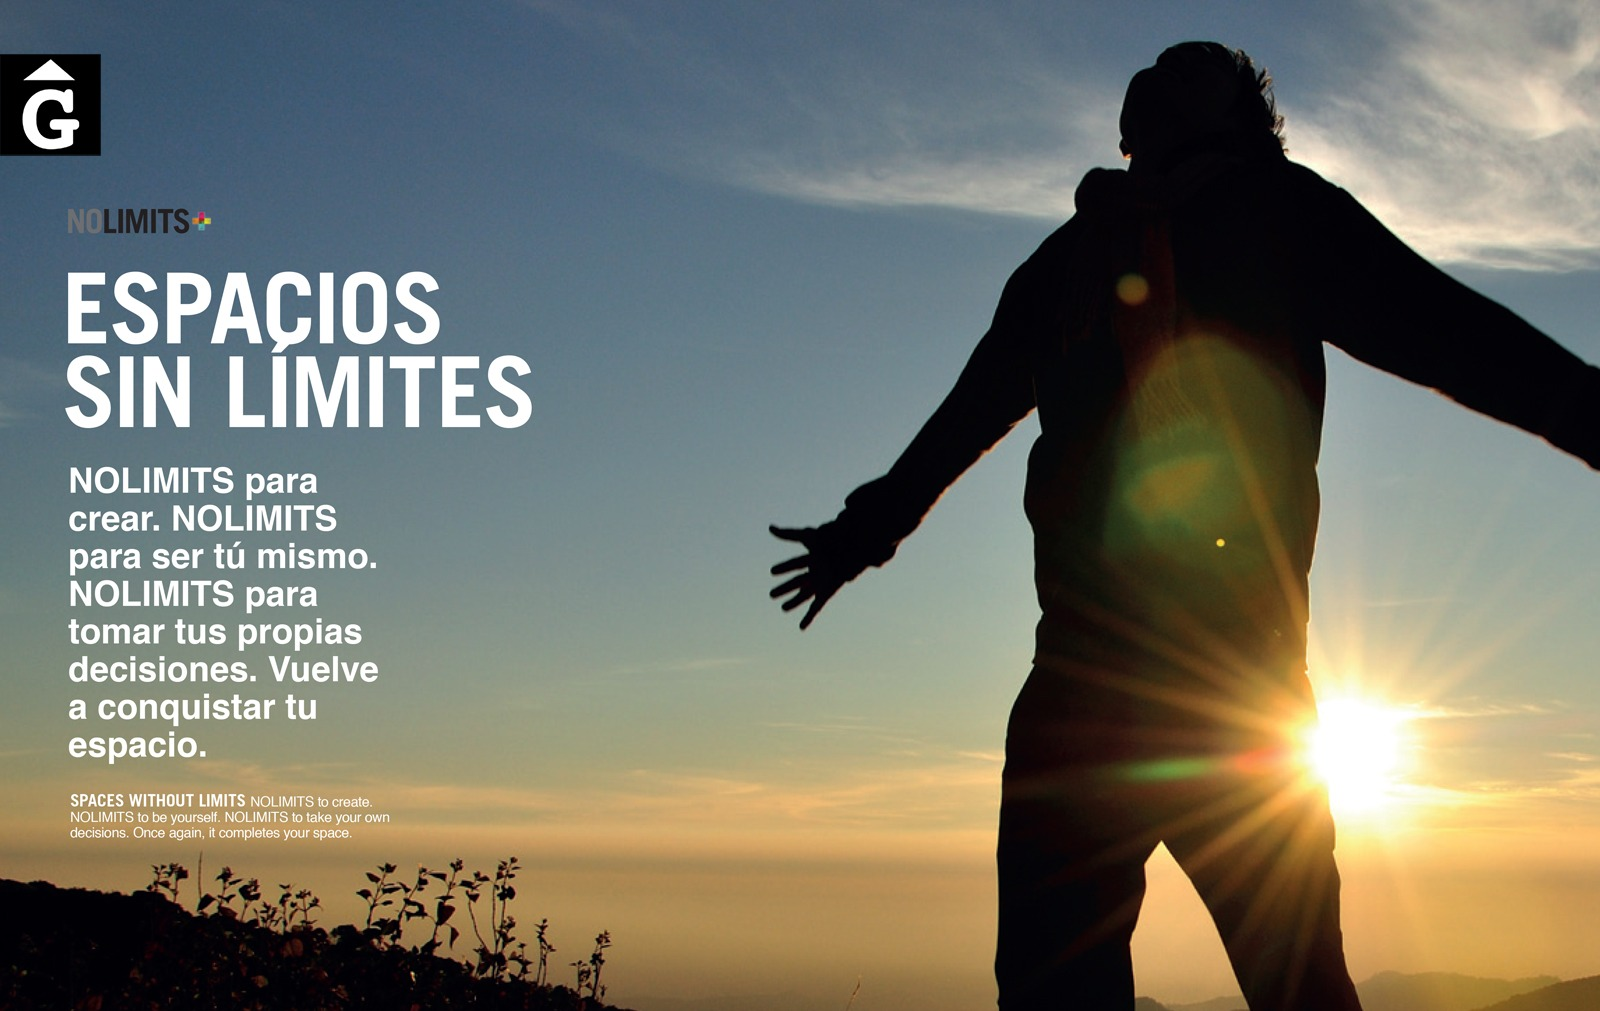 Espais sense límits amb JJP NoLimits by Mobles GIFREU Girona Armaris a mida modern minim elegant atemporal